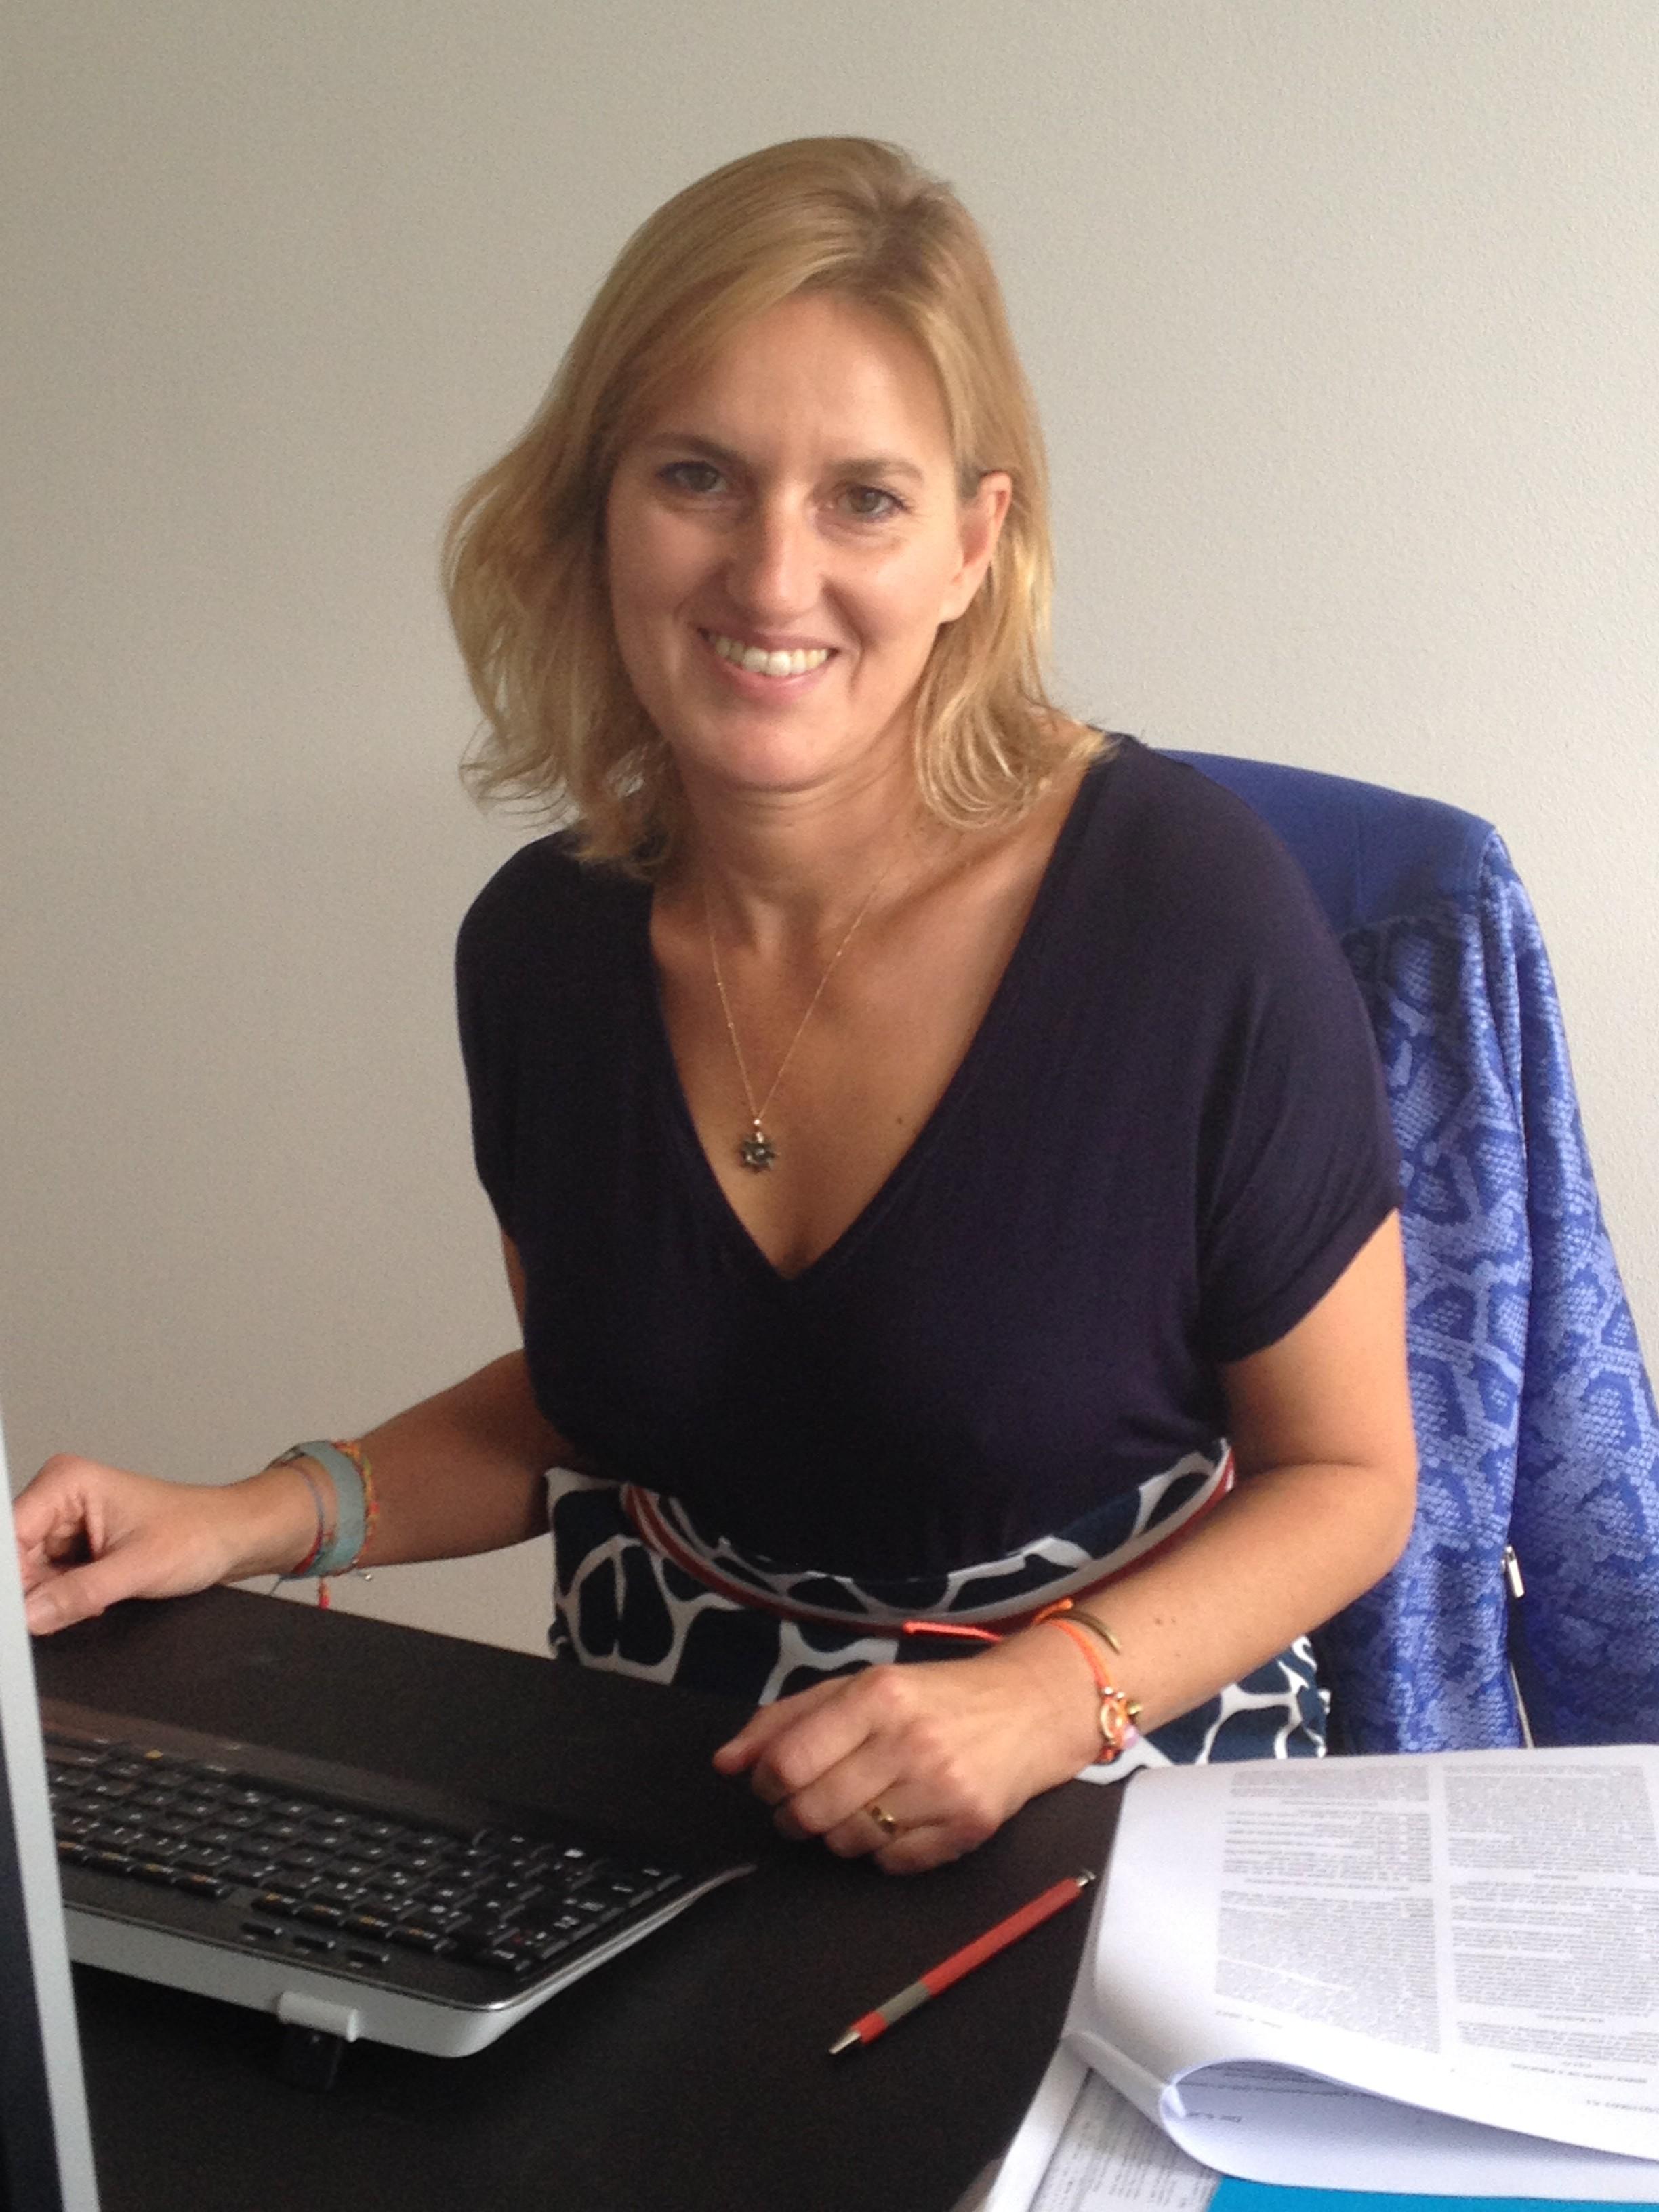 Internship epo examiner nordic patent service for Cristina dos santos